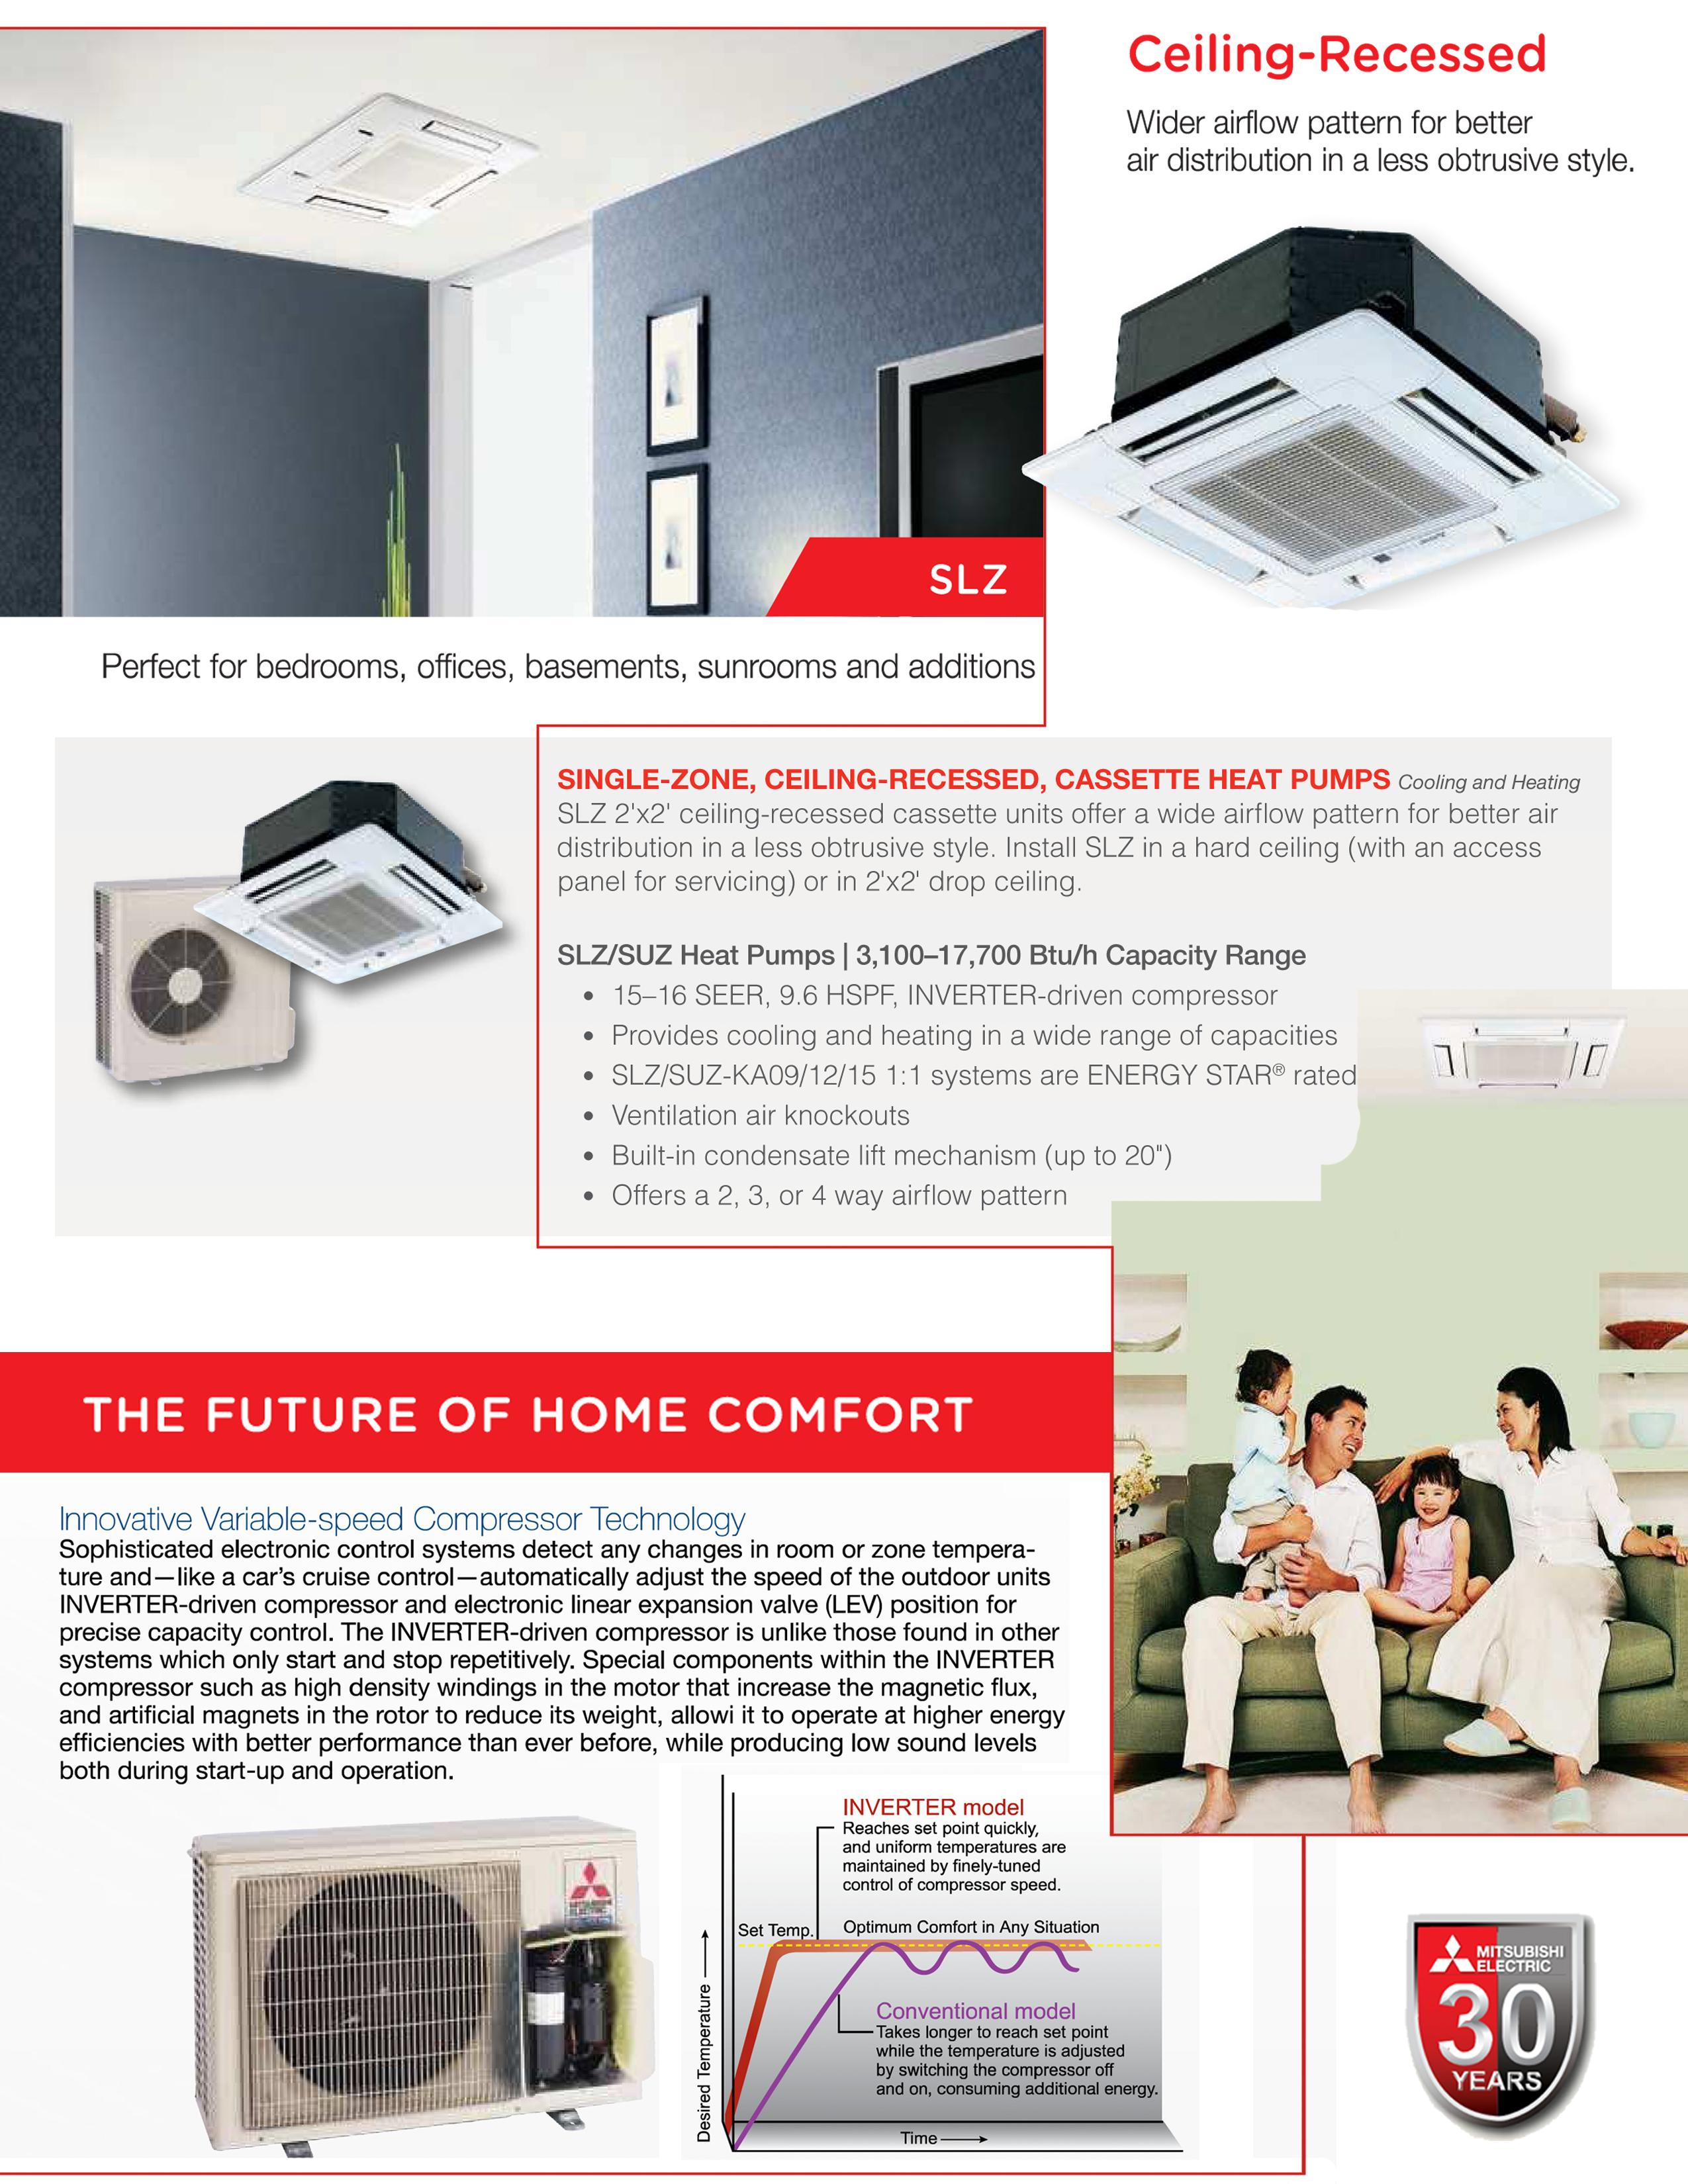 Mini Split 9 000 Btu Mitsubishi 15 Seer Ceiling Cassette